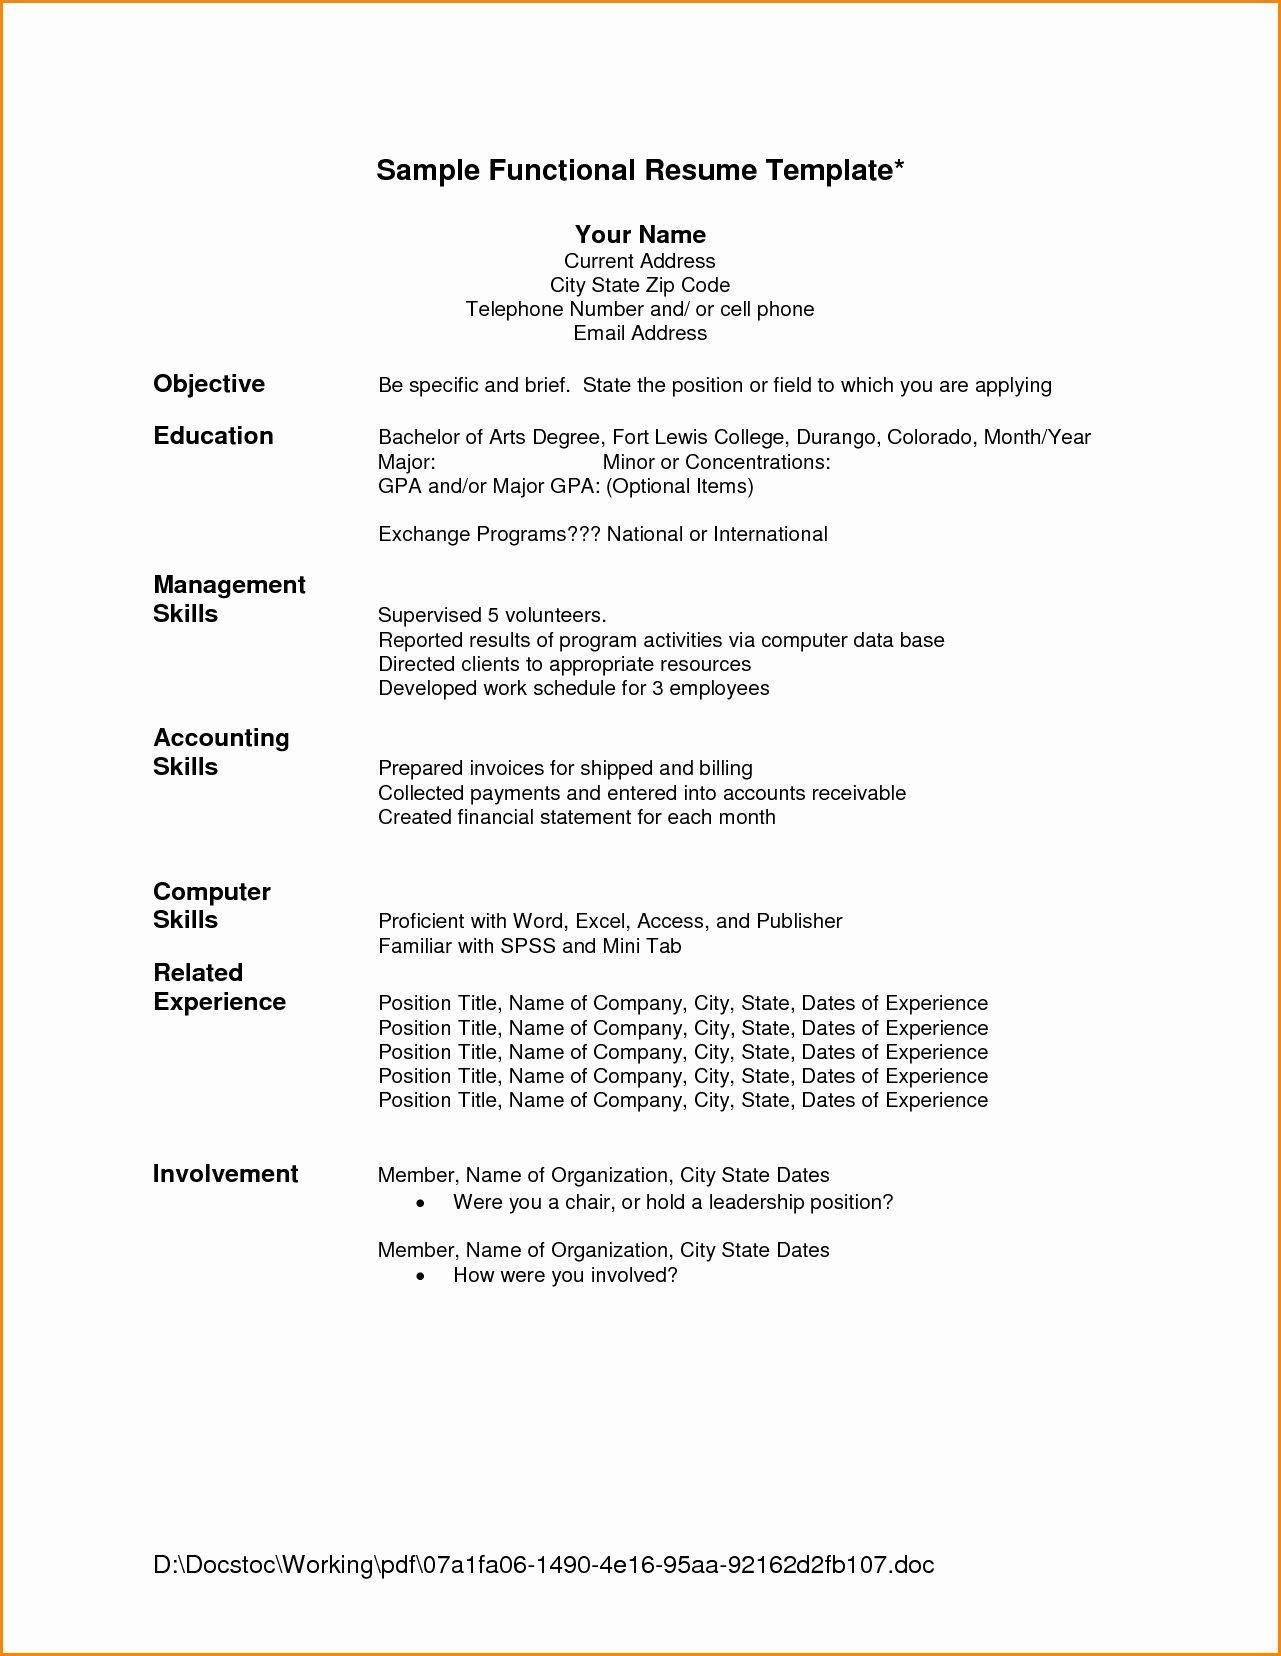 Resume Format Checker #checker #format #resume | Resume Format ...